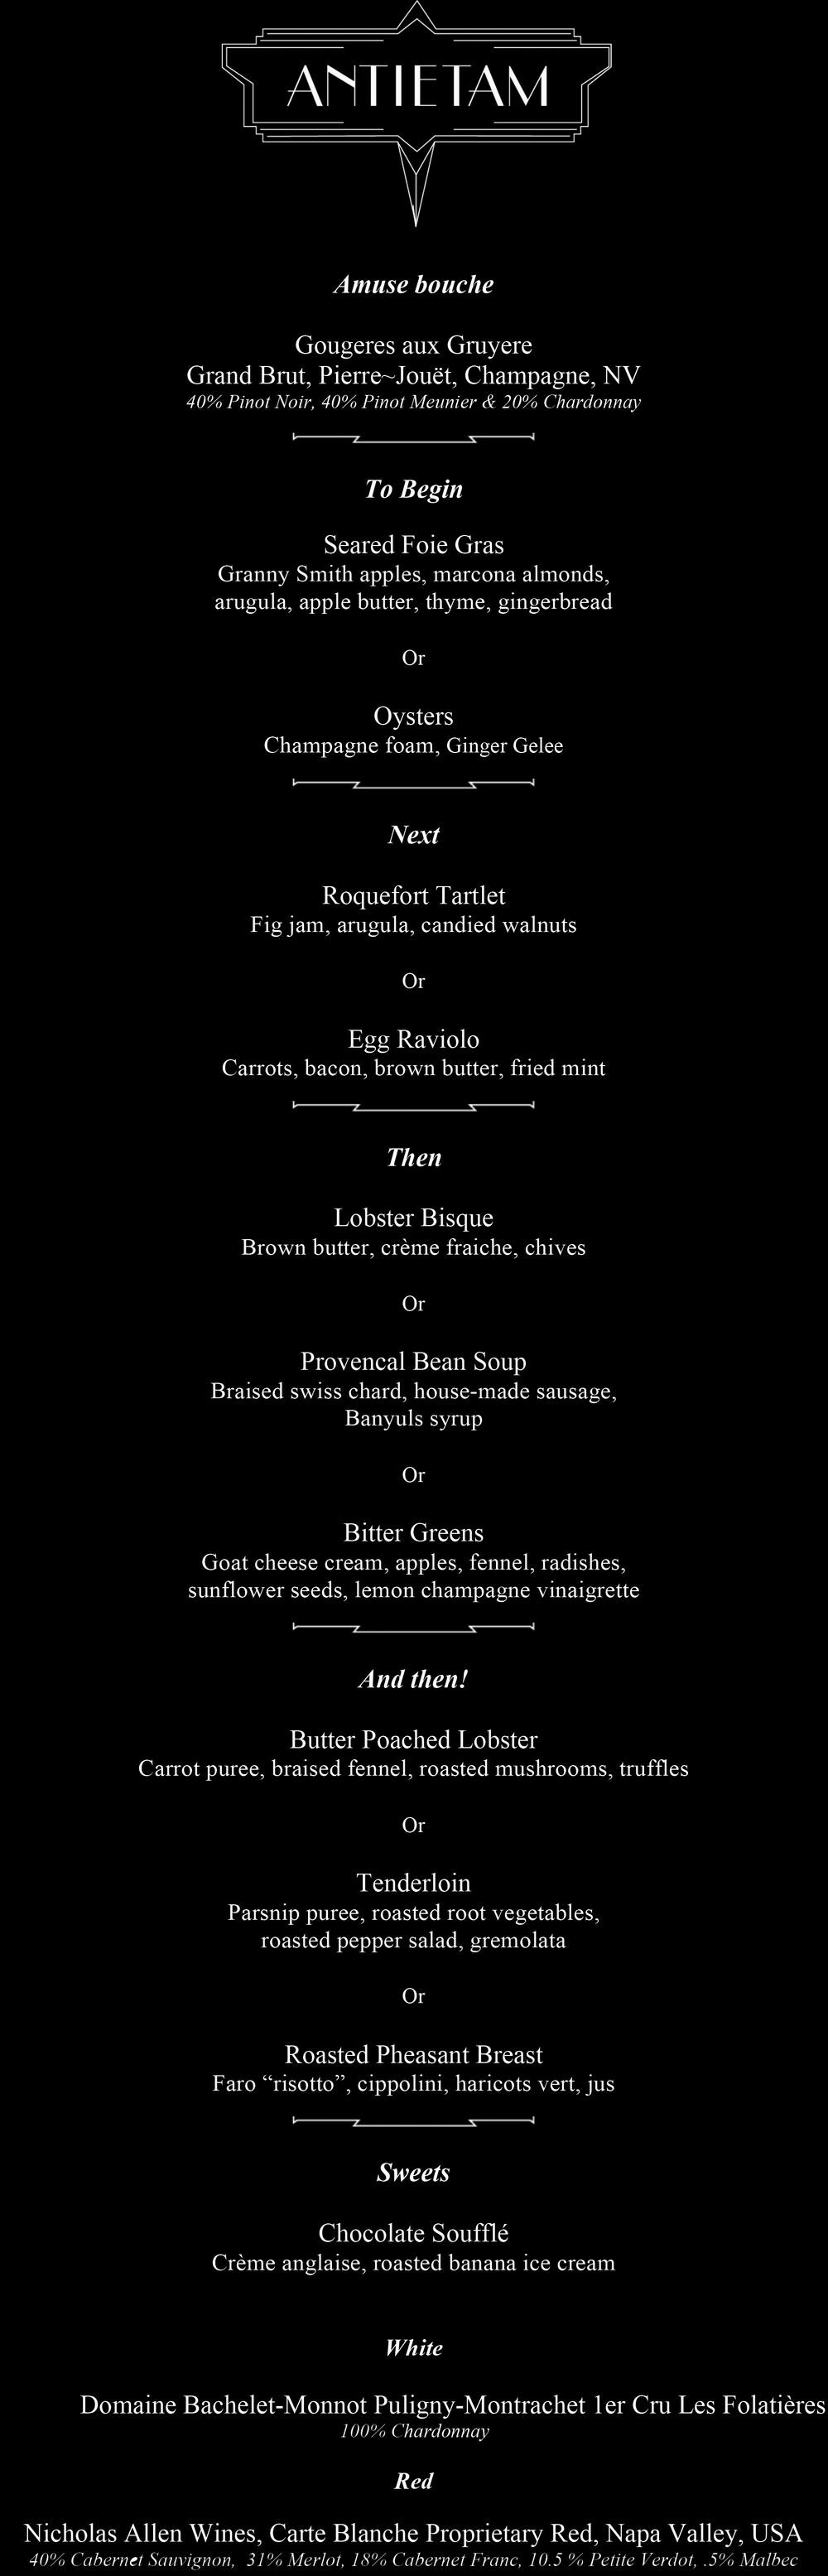 ChefsTableMenu.png